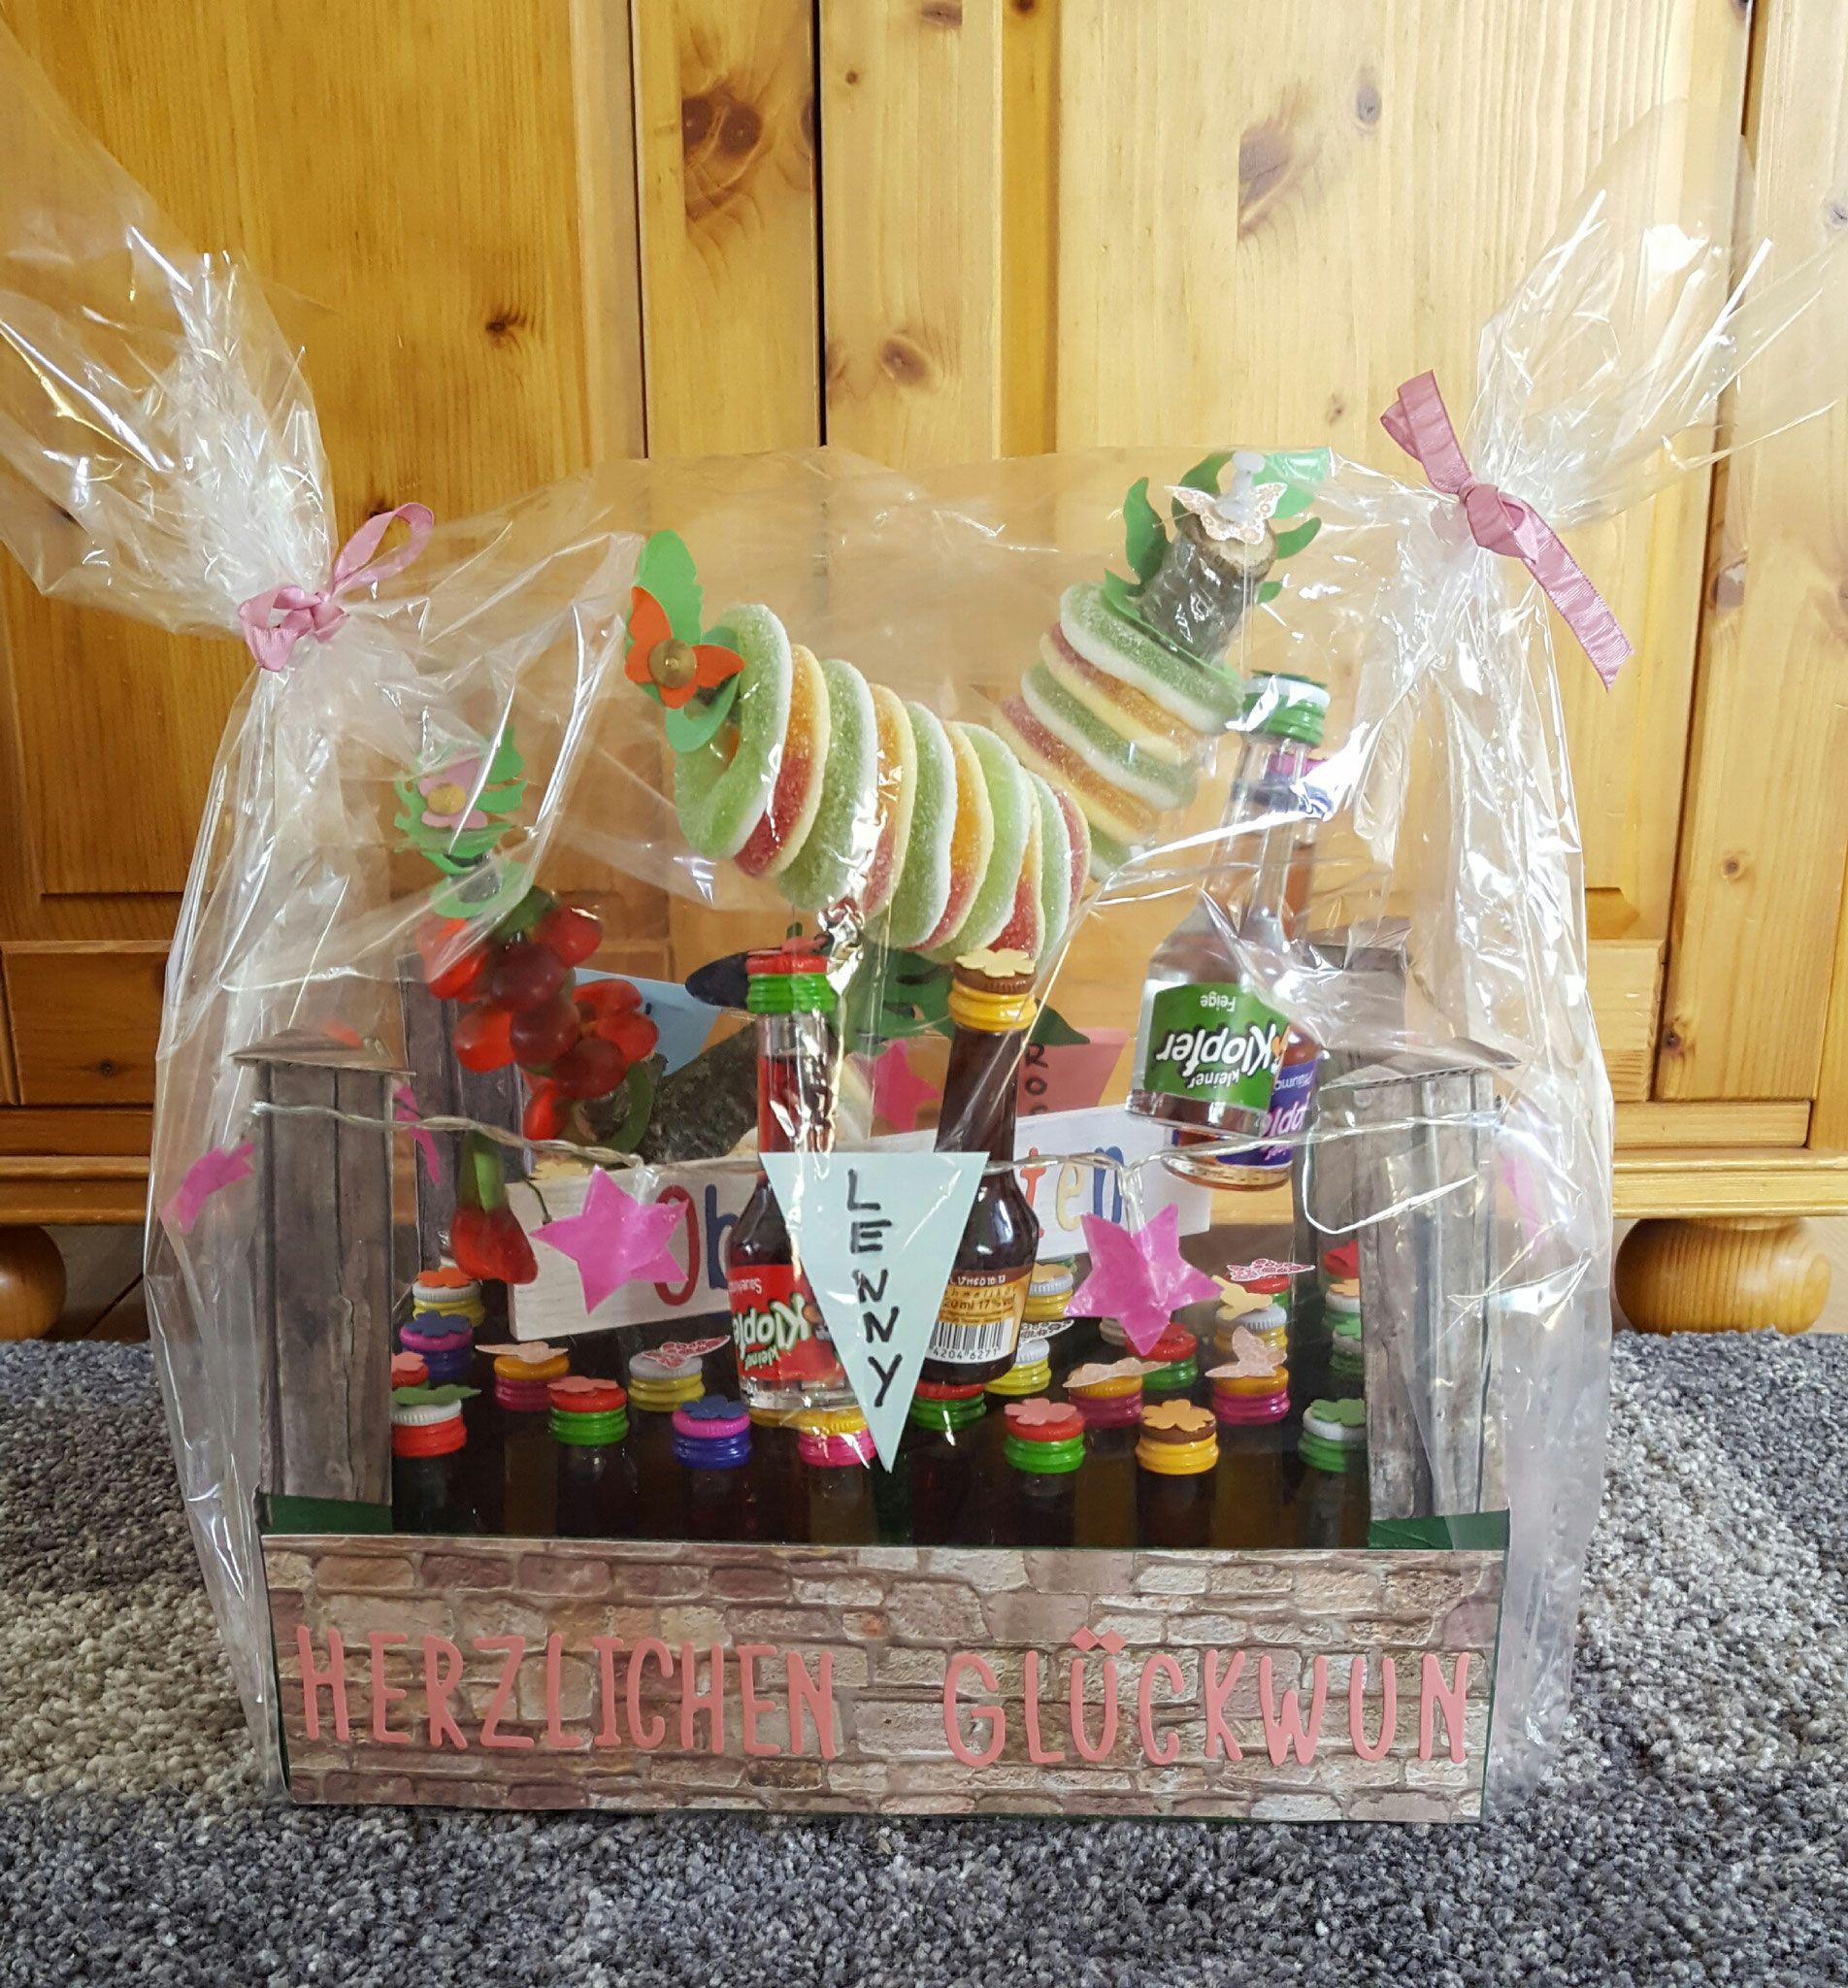 Klopf Klopf Klopfer Party Geschenke Geschenkideen Geburtstagsgeschenk